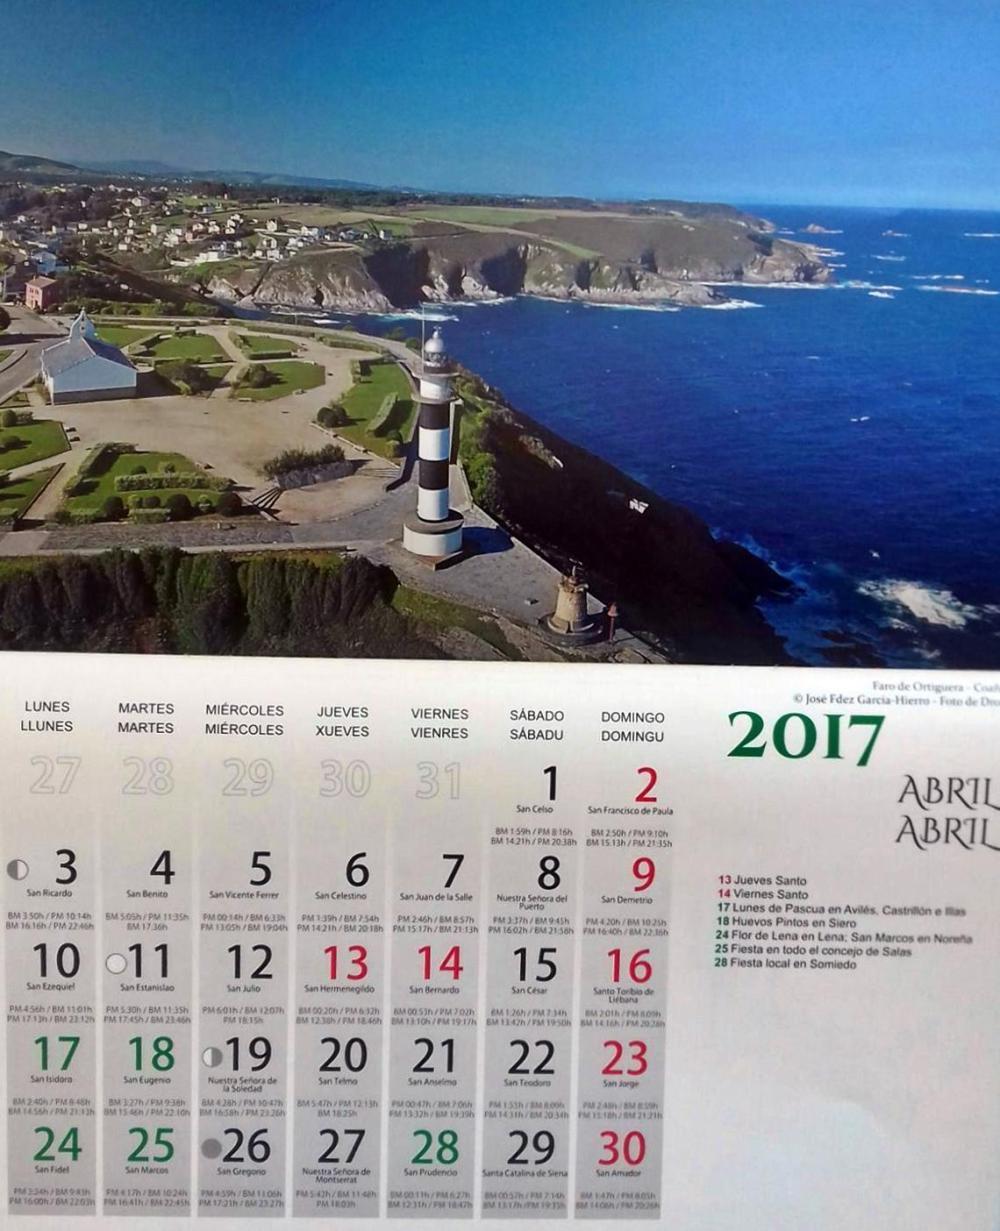 air drone view aereo aerial imagenes video extremadura badajoz asturias trabajos aereos rpa uav vuelo legal operador (2)